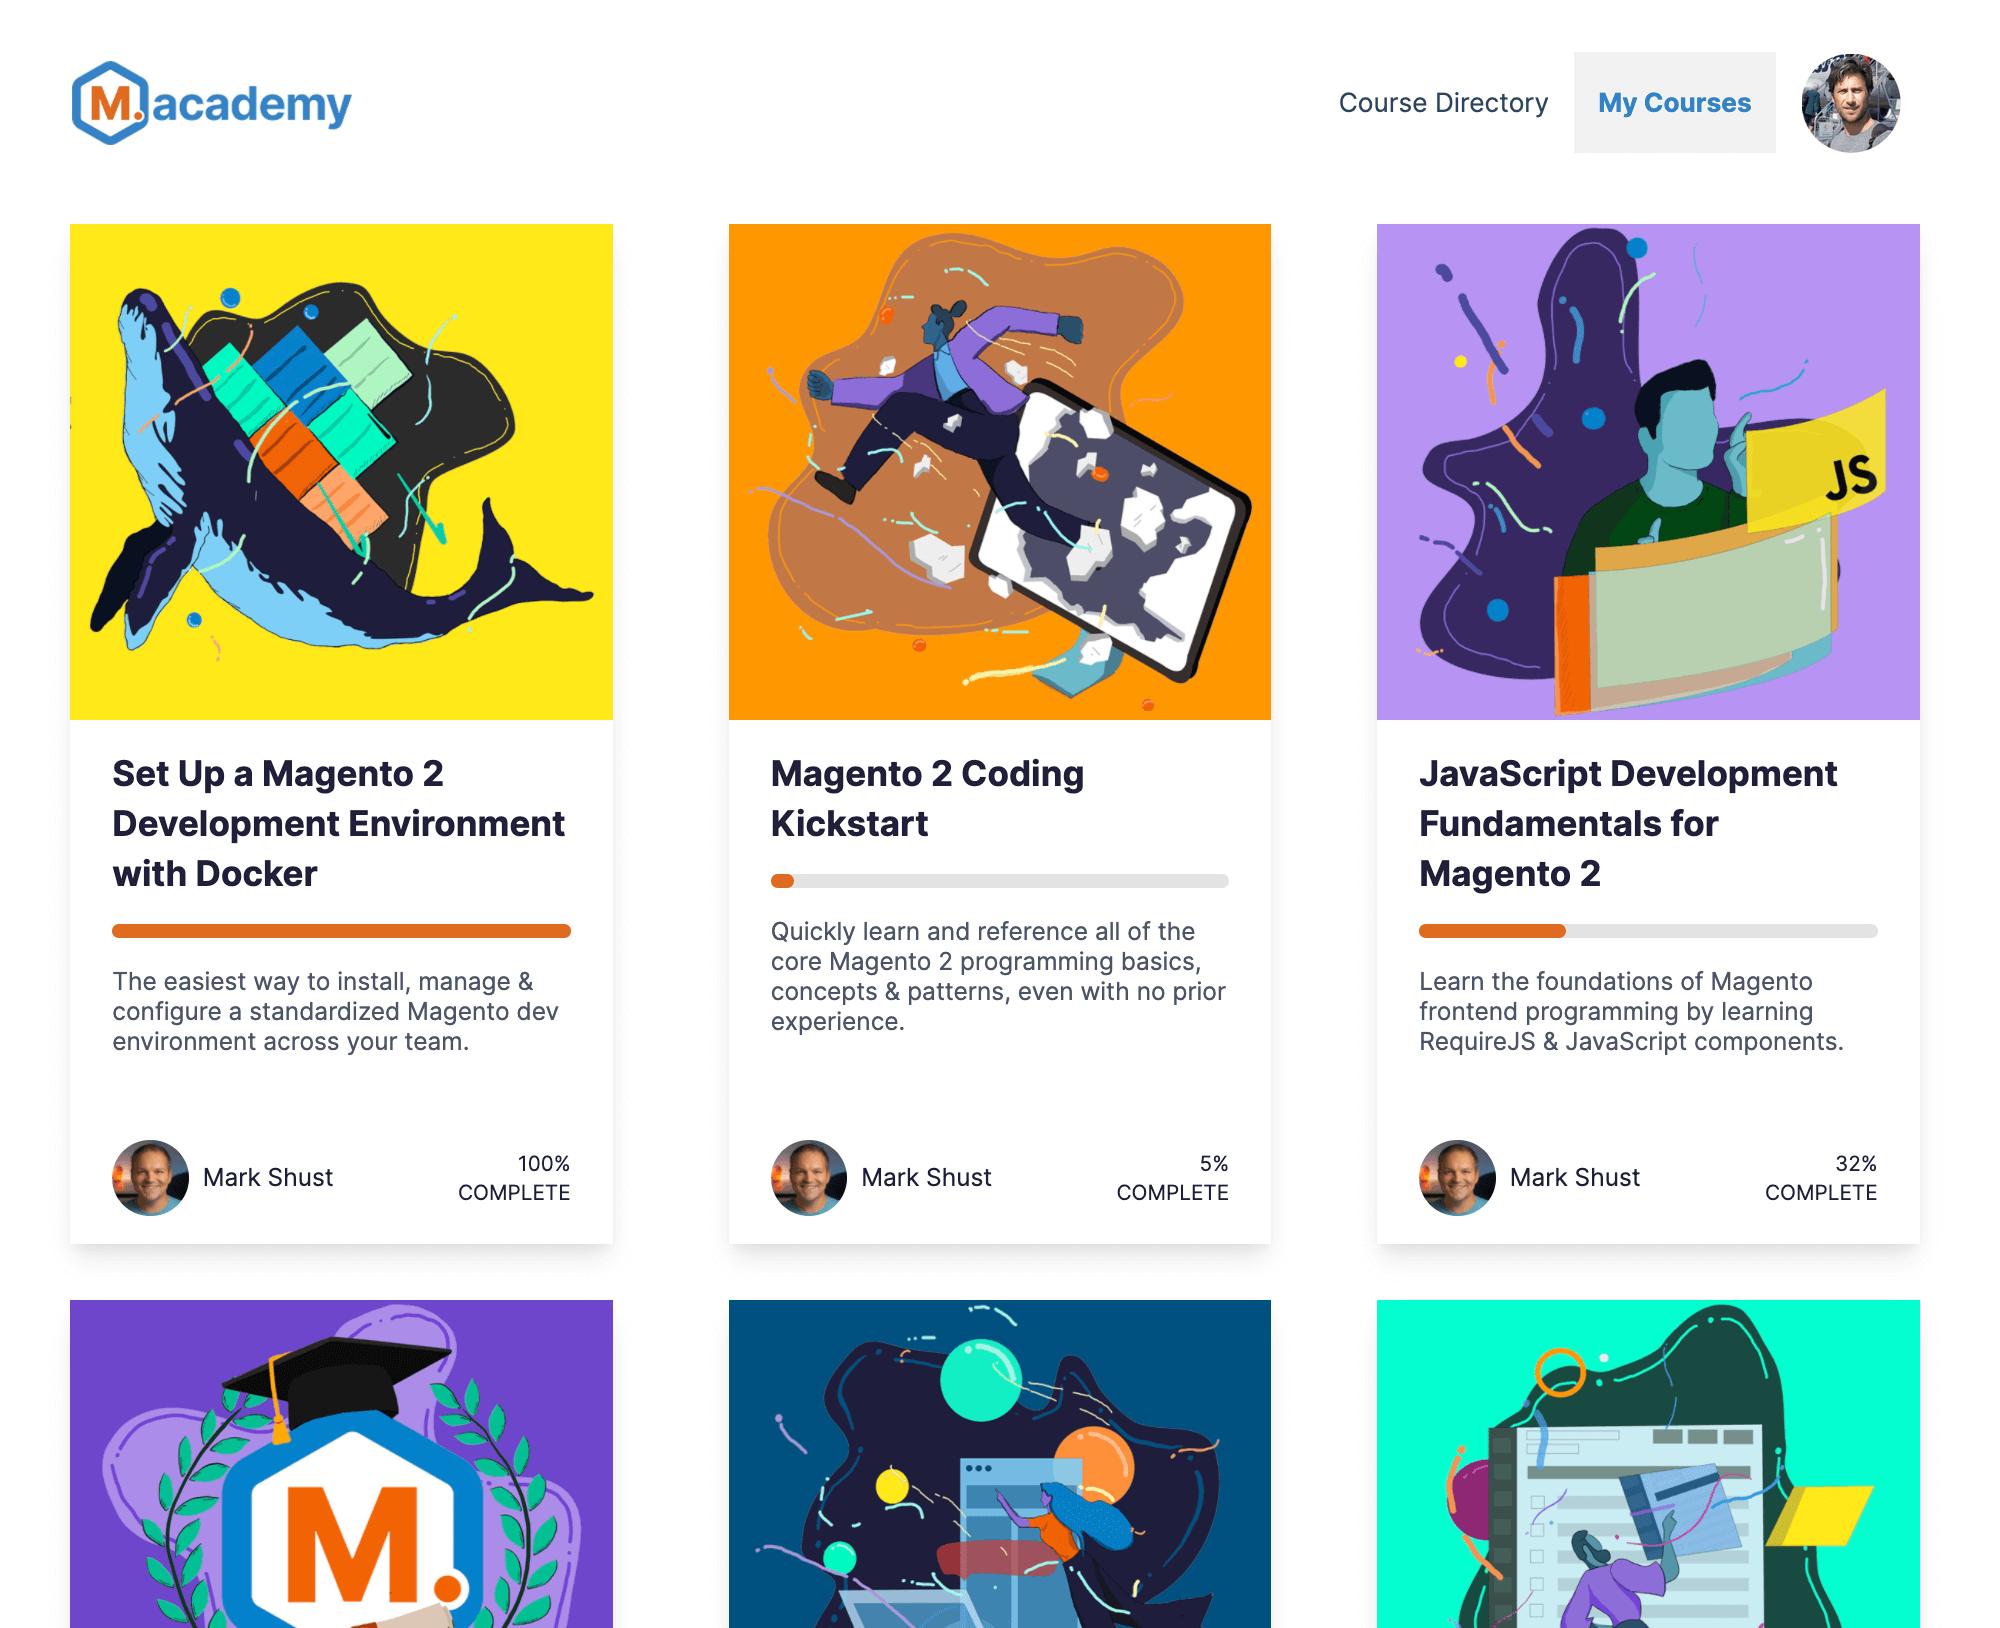 M.academy course portal